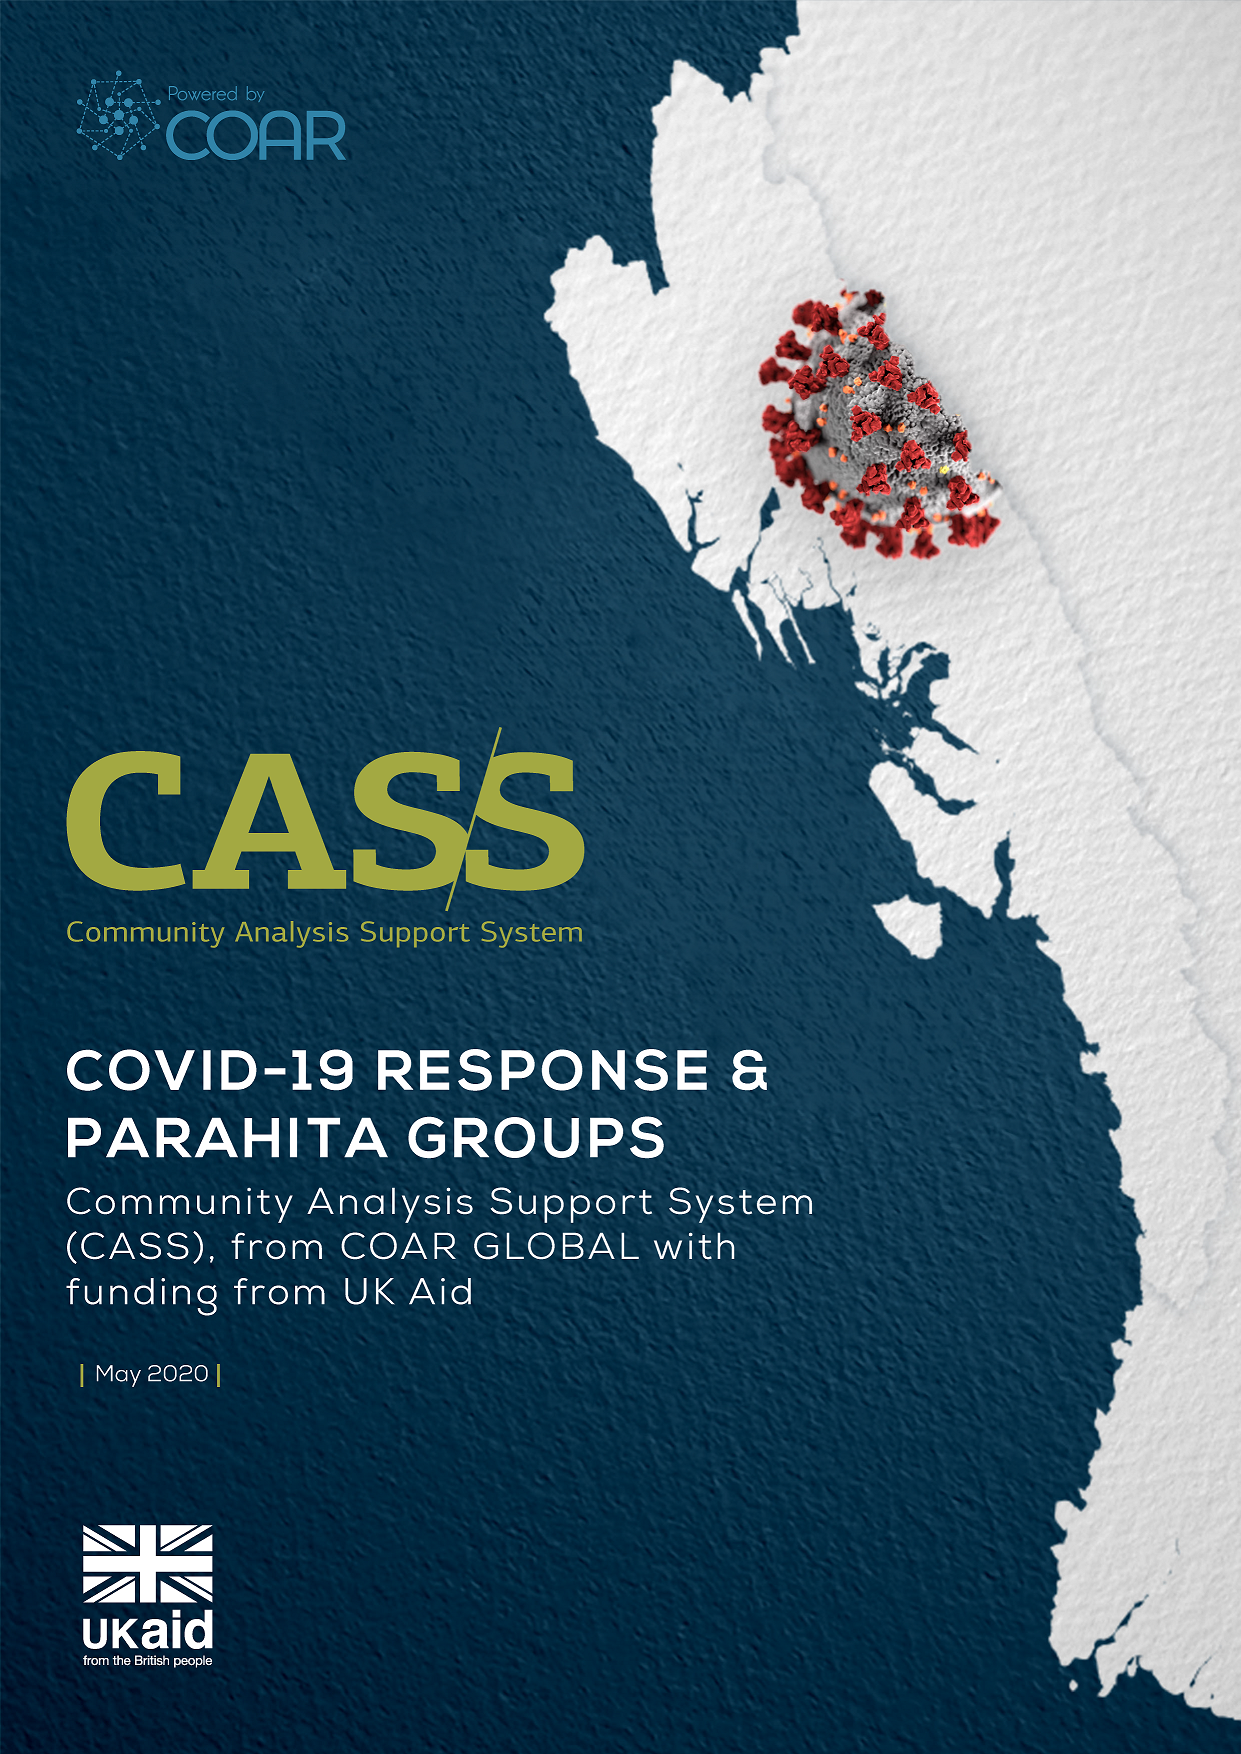 Covid-19 Response & Parahita Groups